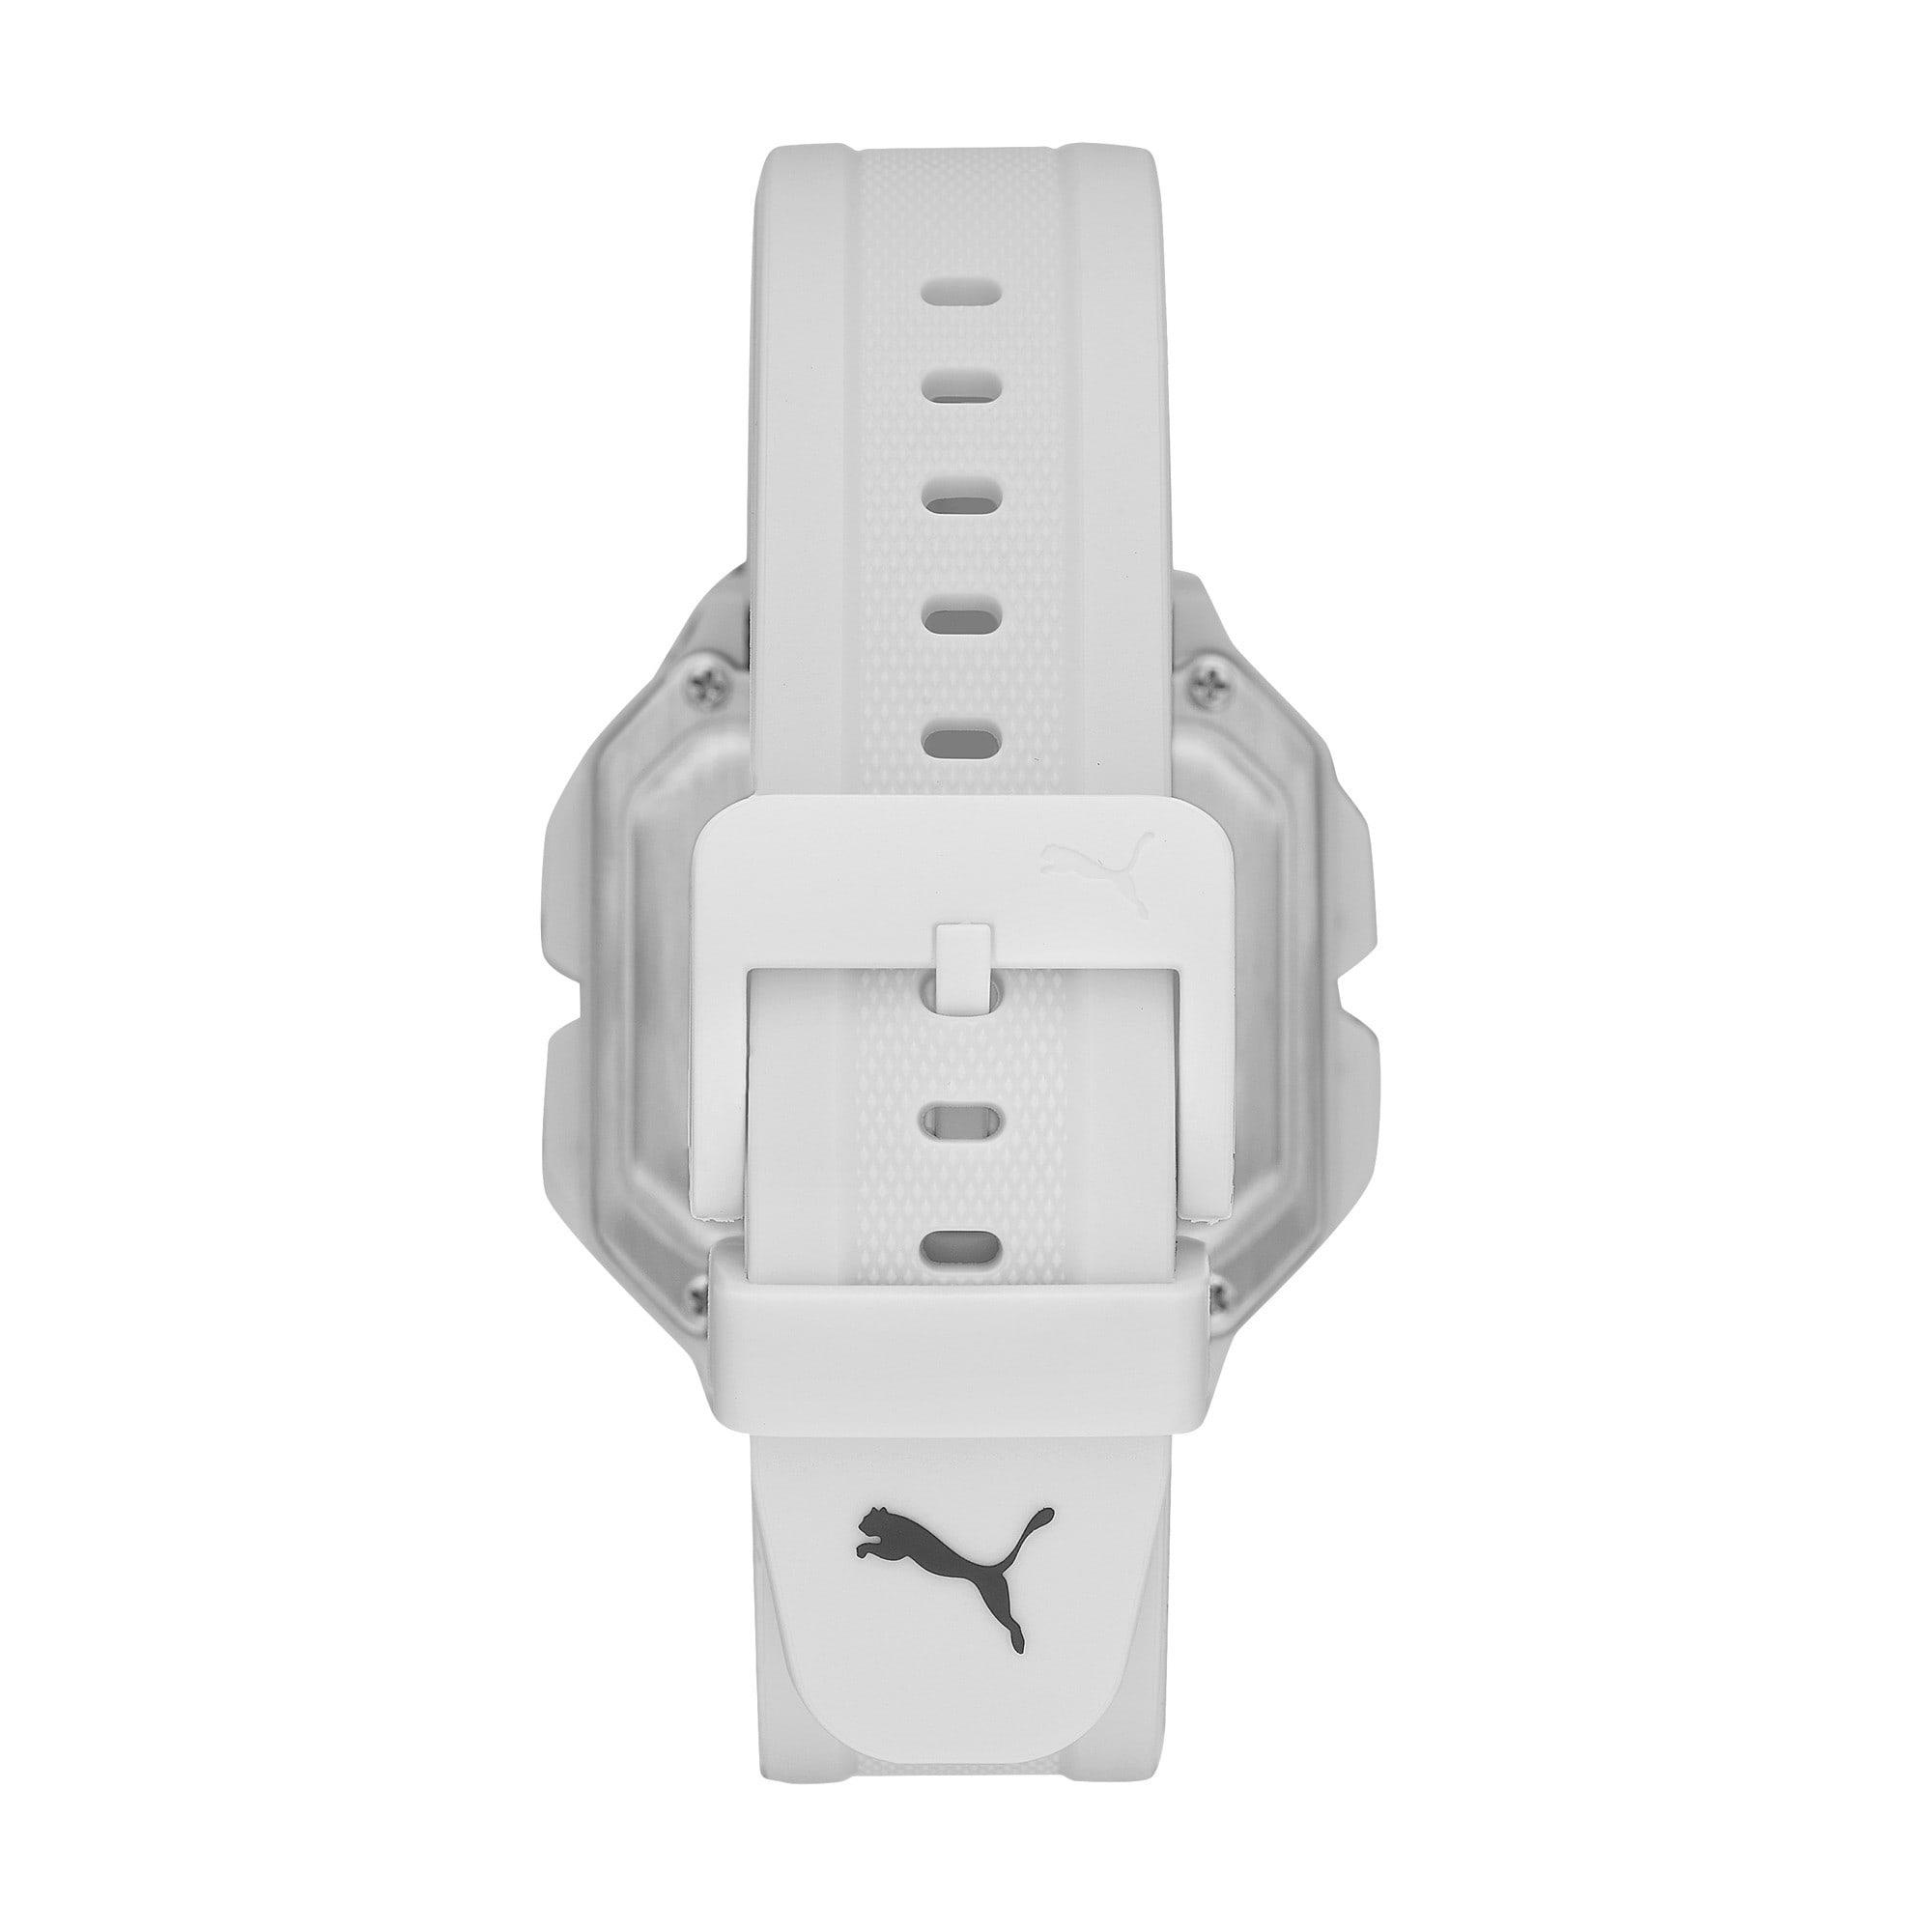 Thumbnail 2 of Remix White Digital Watch, White/White, medium